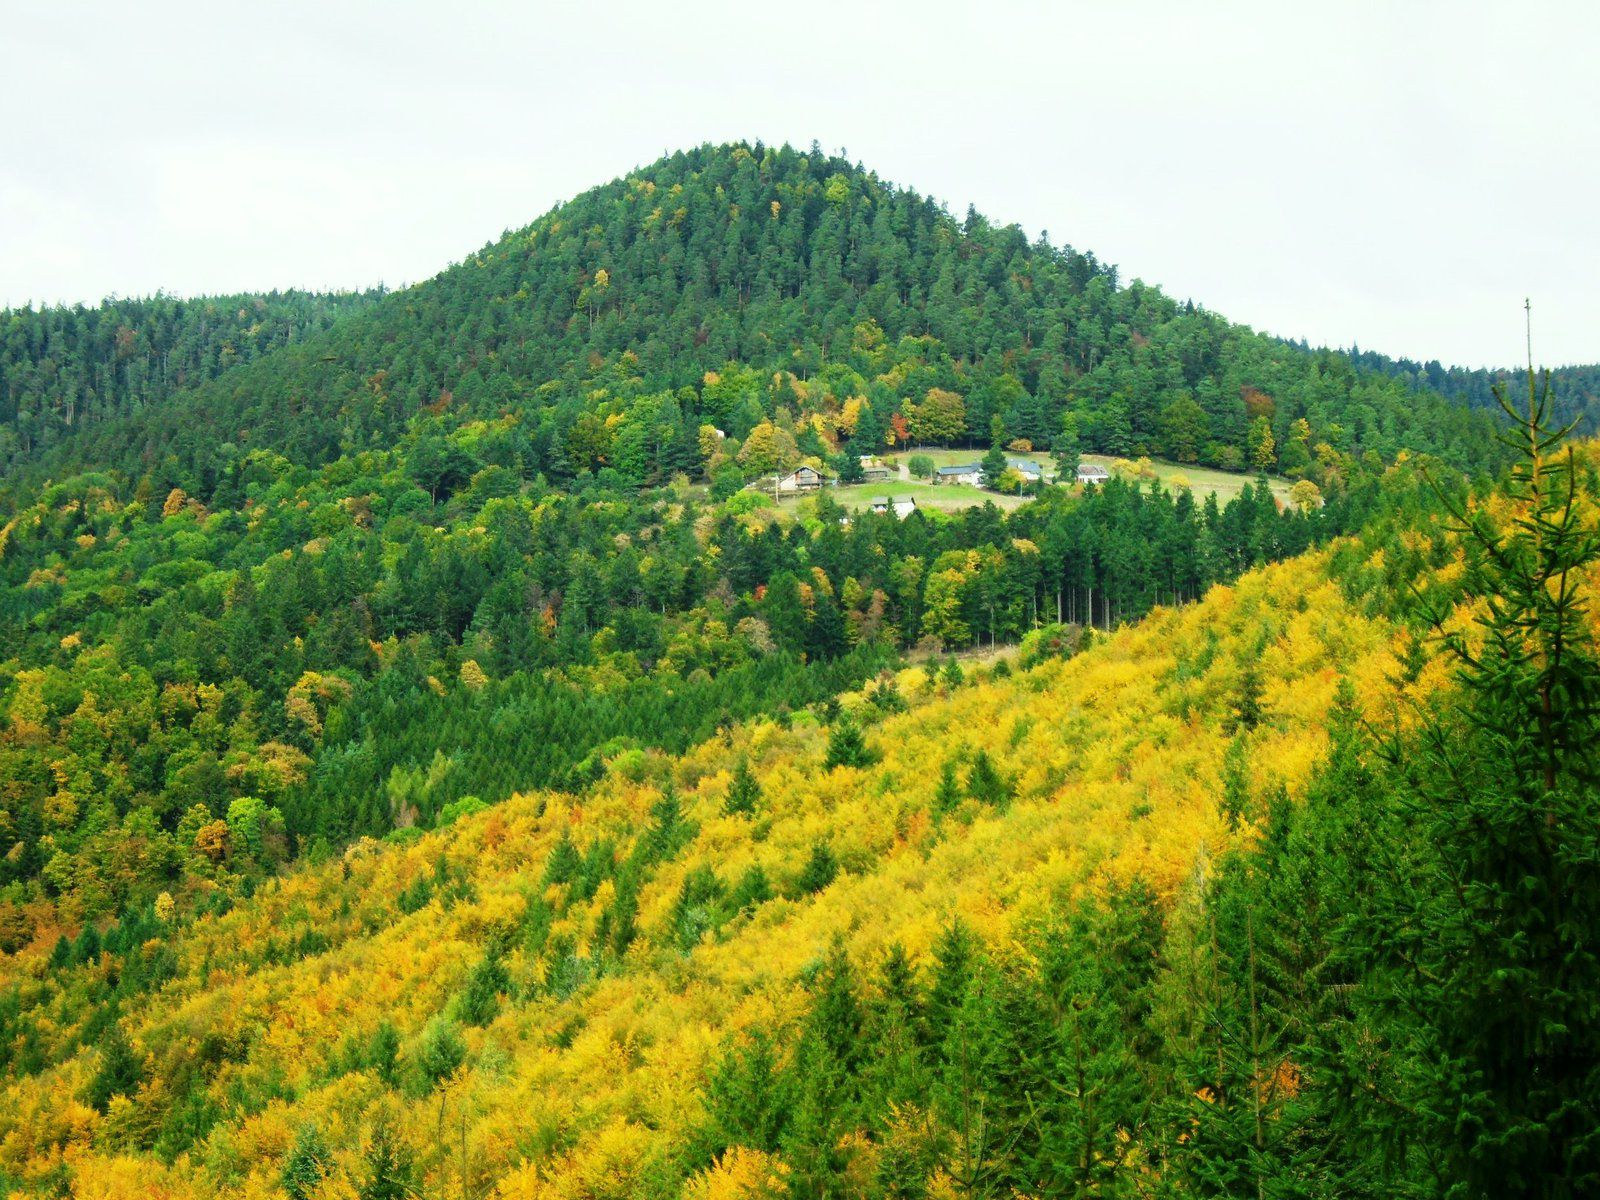 Mercredi 9 novembre - Randonnée de Ribeauvillé au Schelmenkopf